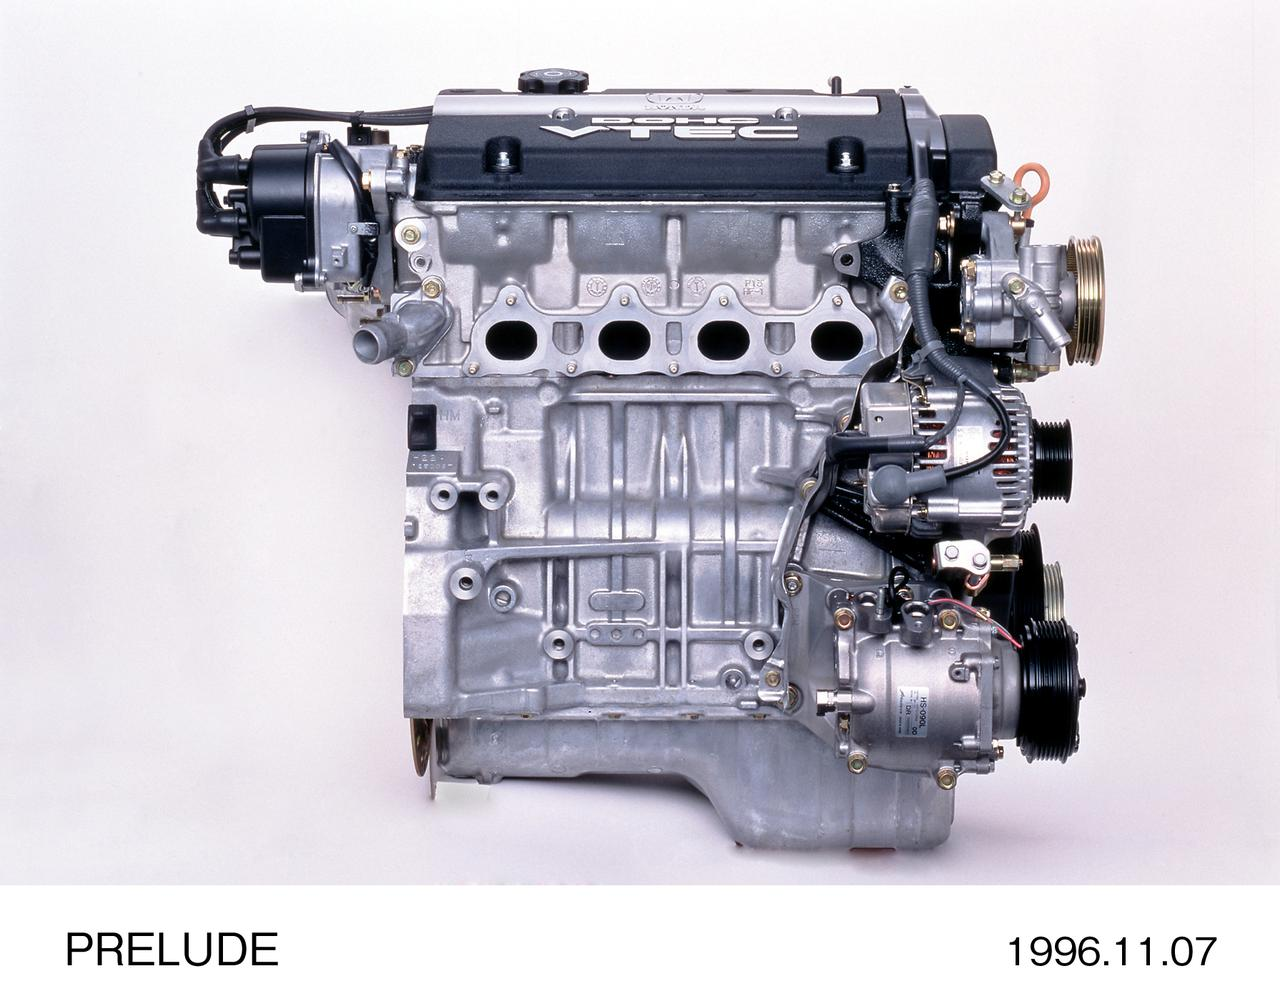 Images : 1番目の画像 - ホンダ プレリュード関連画像(クリックして拡大) - A Little Honda | ア・リトル・ホンダ(リトホン)